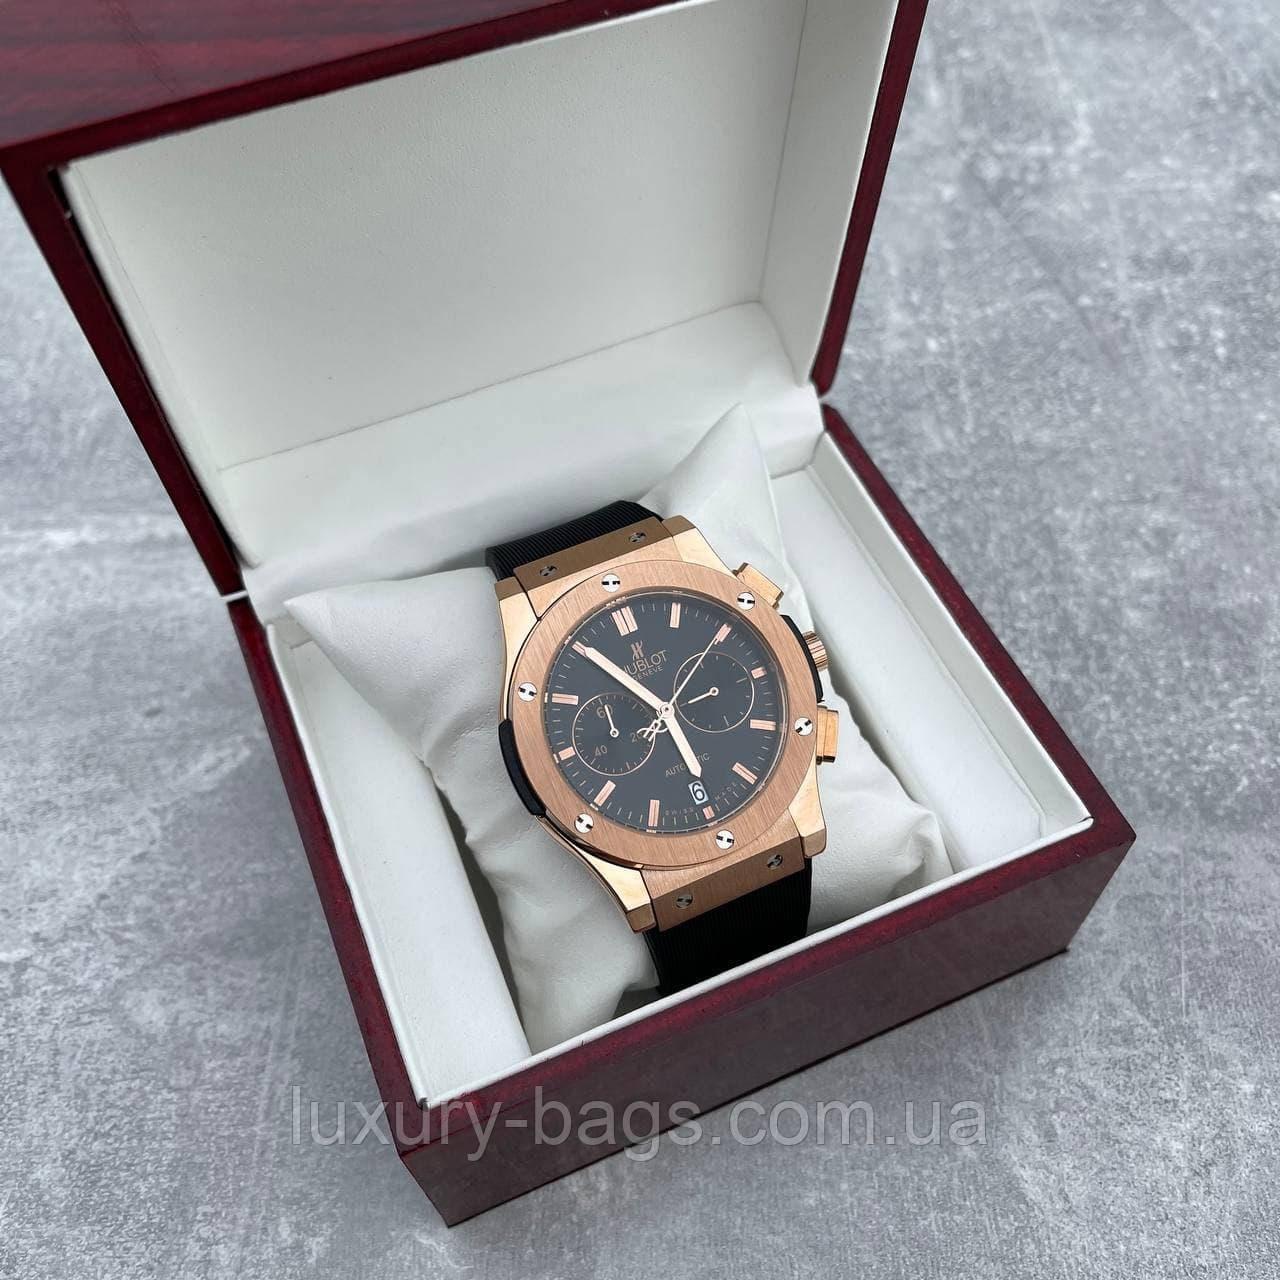 Часы наручные Hublot 5828 Classic Fusion Black-Gold-Black